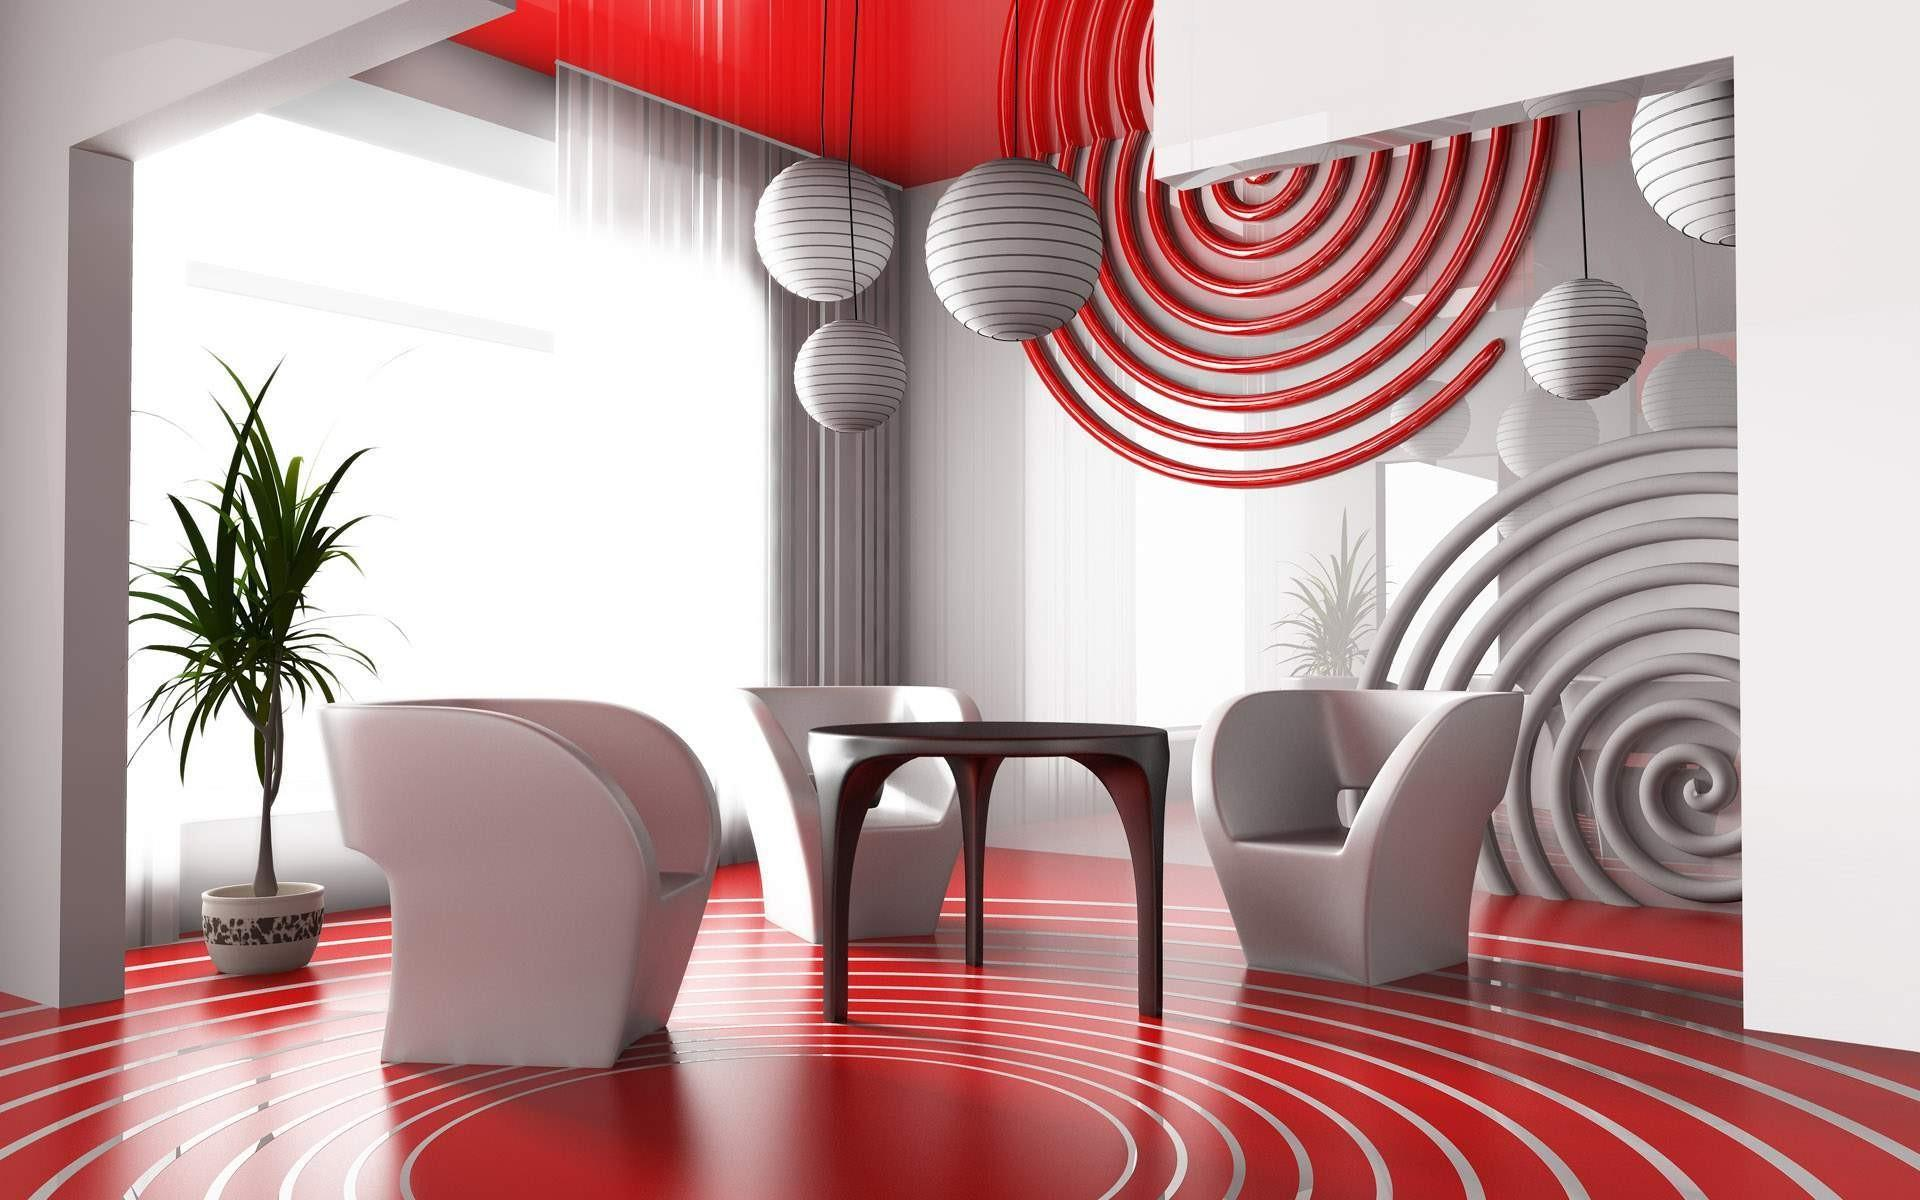 interior-wallpapers-28651-4461869.jpg